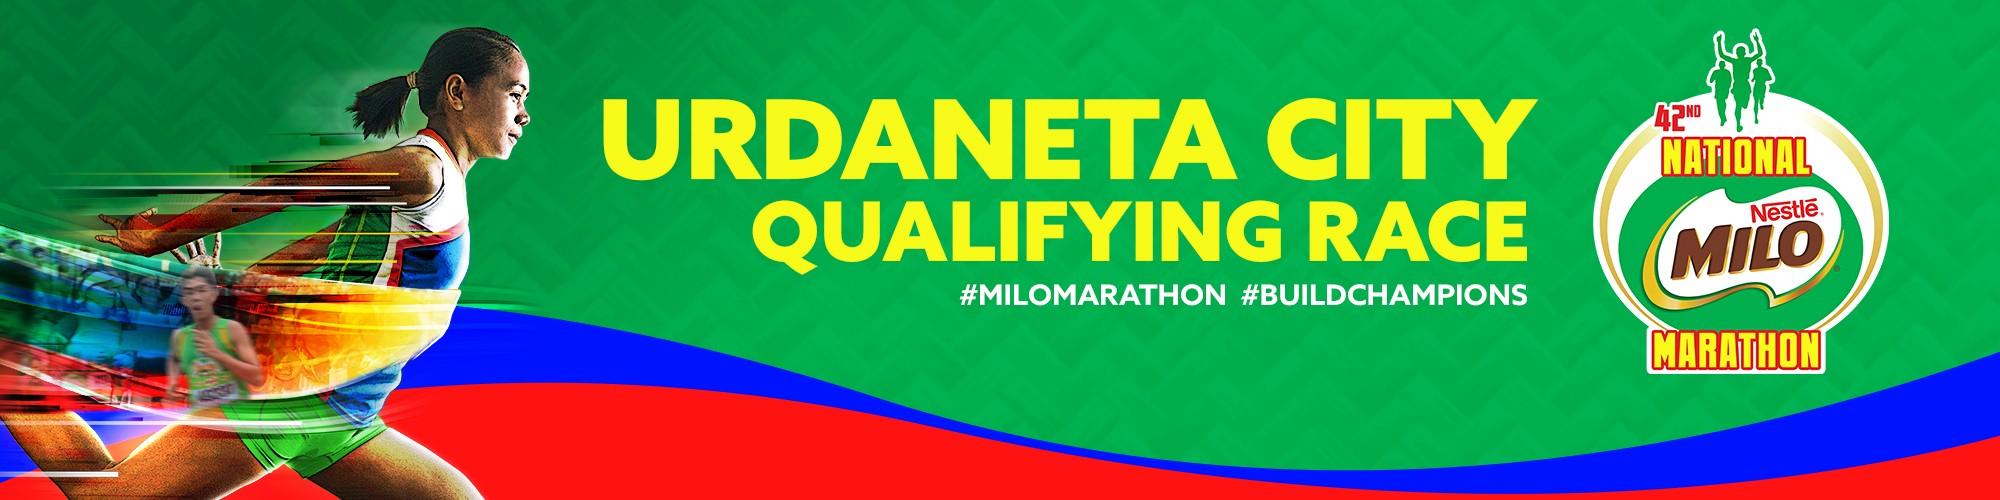 2019 National MILO Marathon Urdaneta City